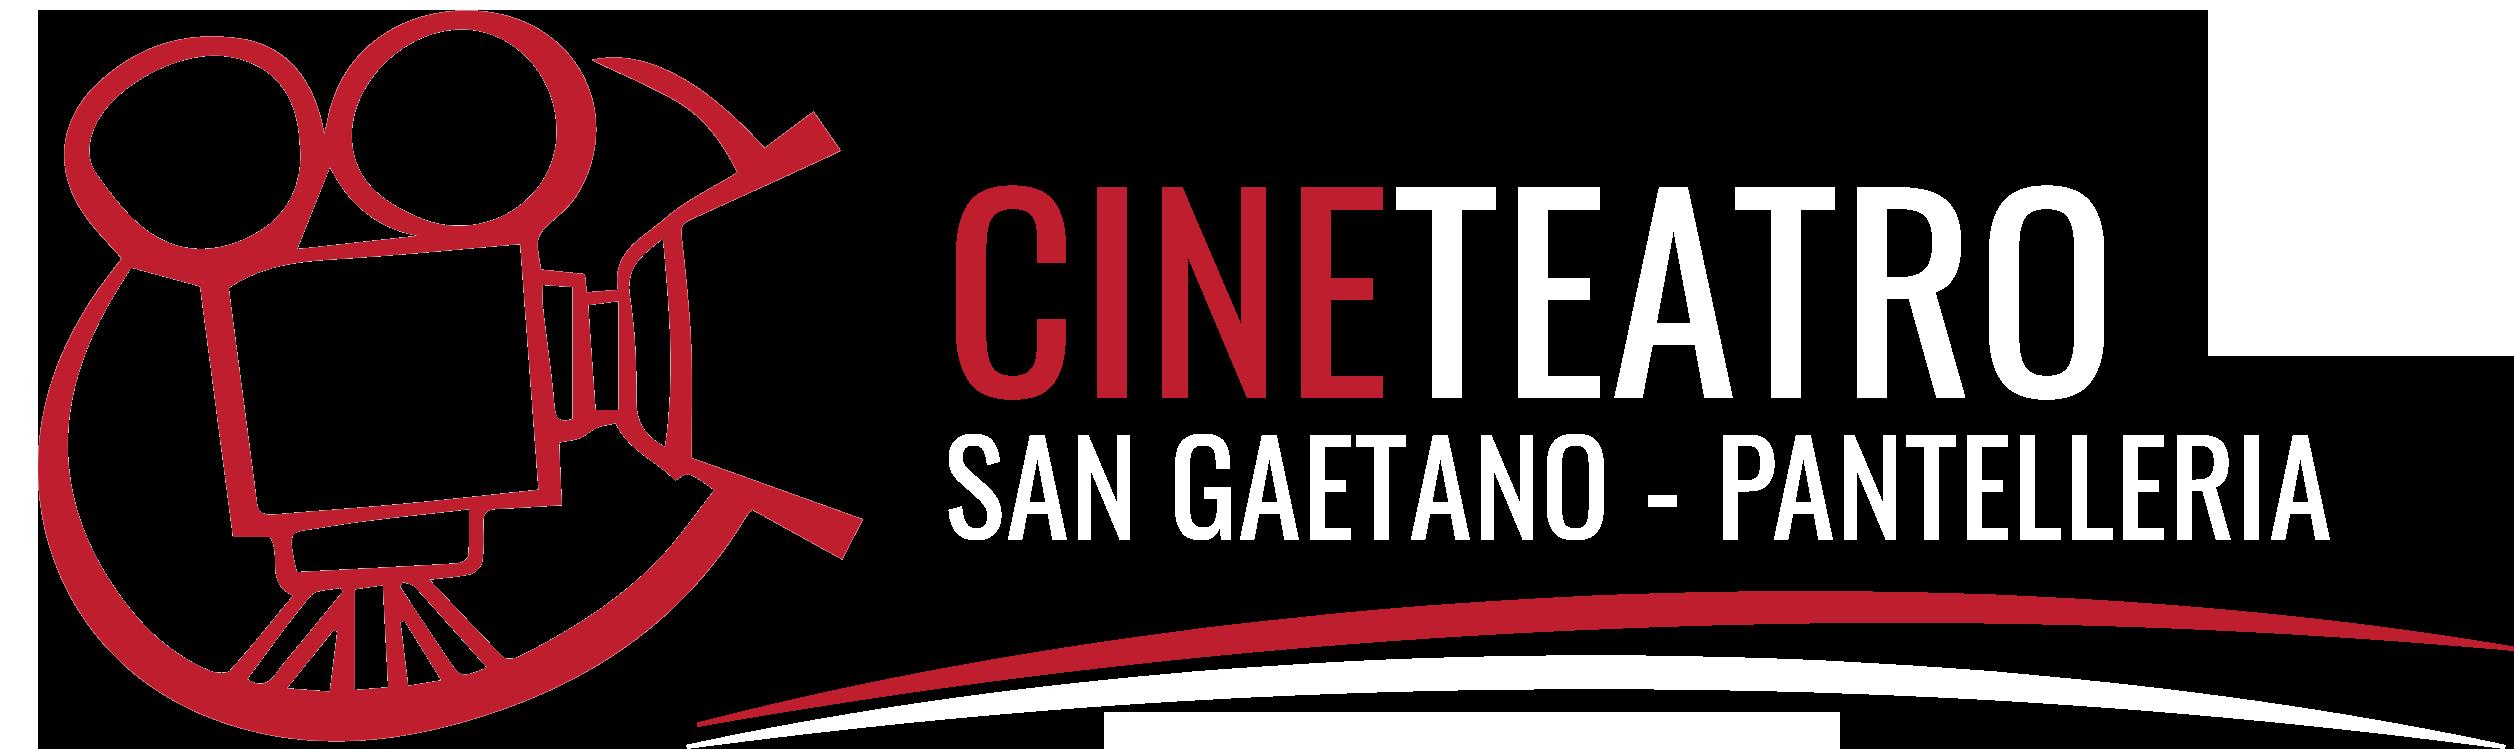 Home cineteatro san gaetano pantelleria for Logo sito internet